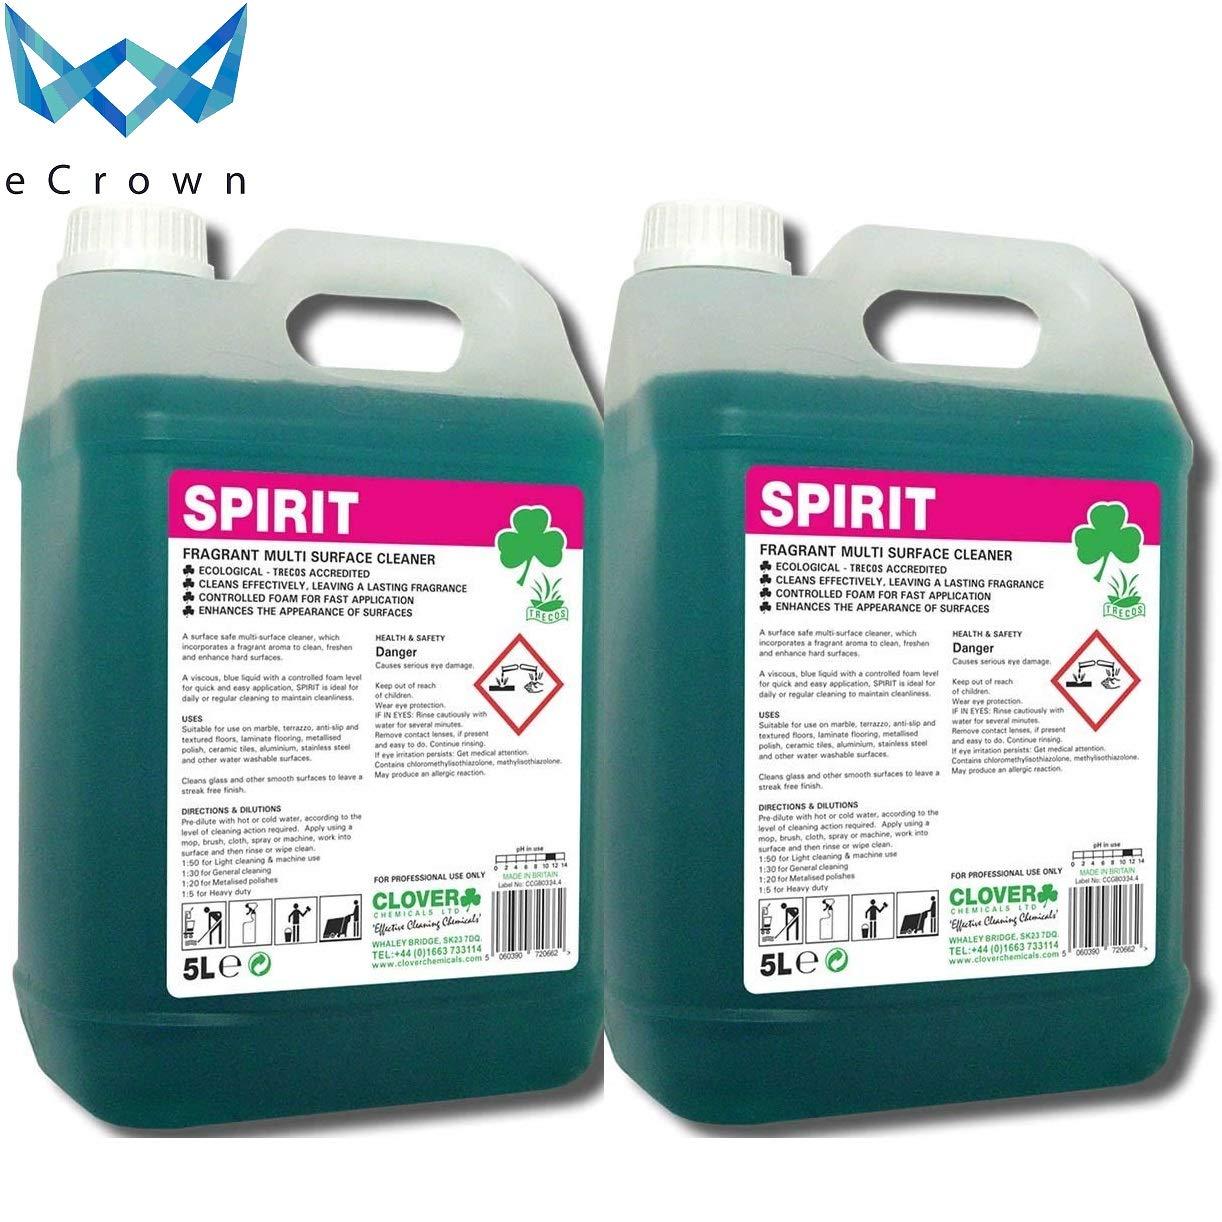 Spirit Fragrant Multi-Surface Cleaner ~ 2 x 5 Litre eCrown